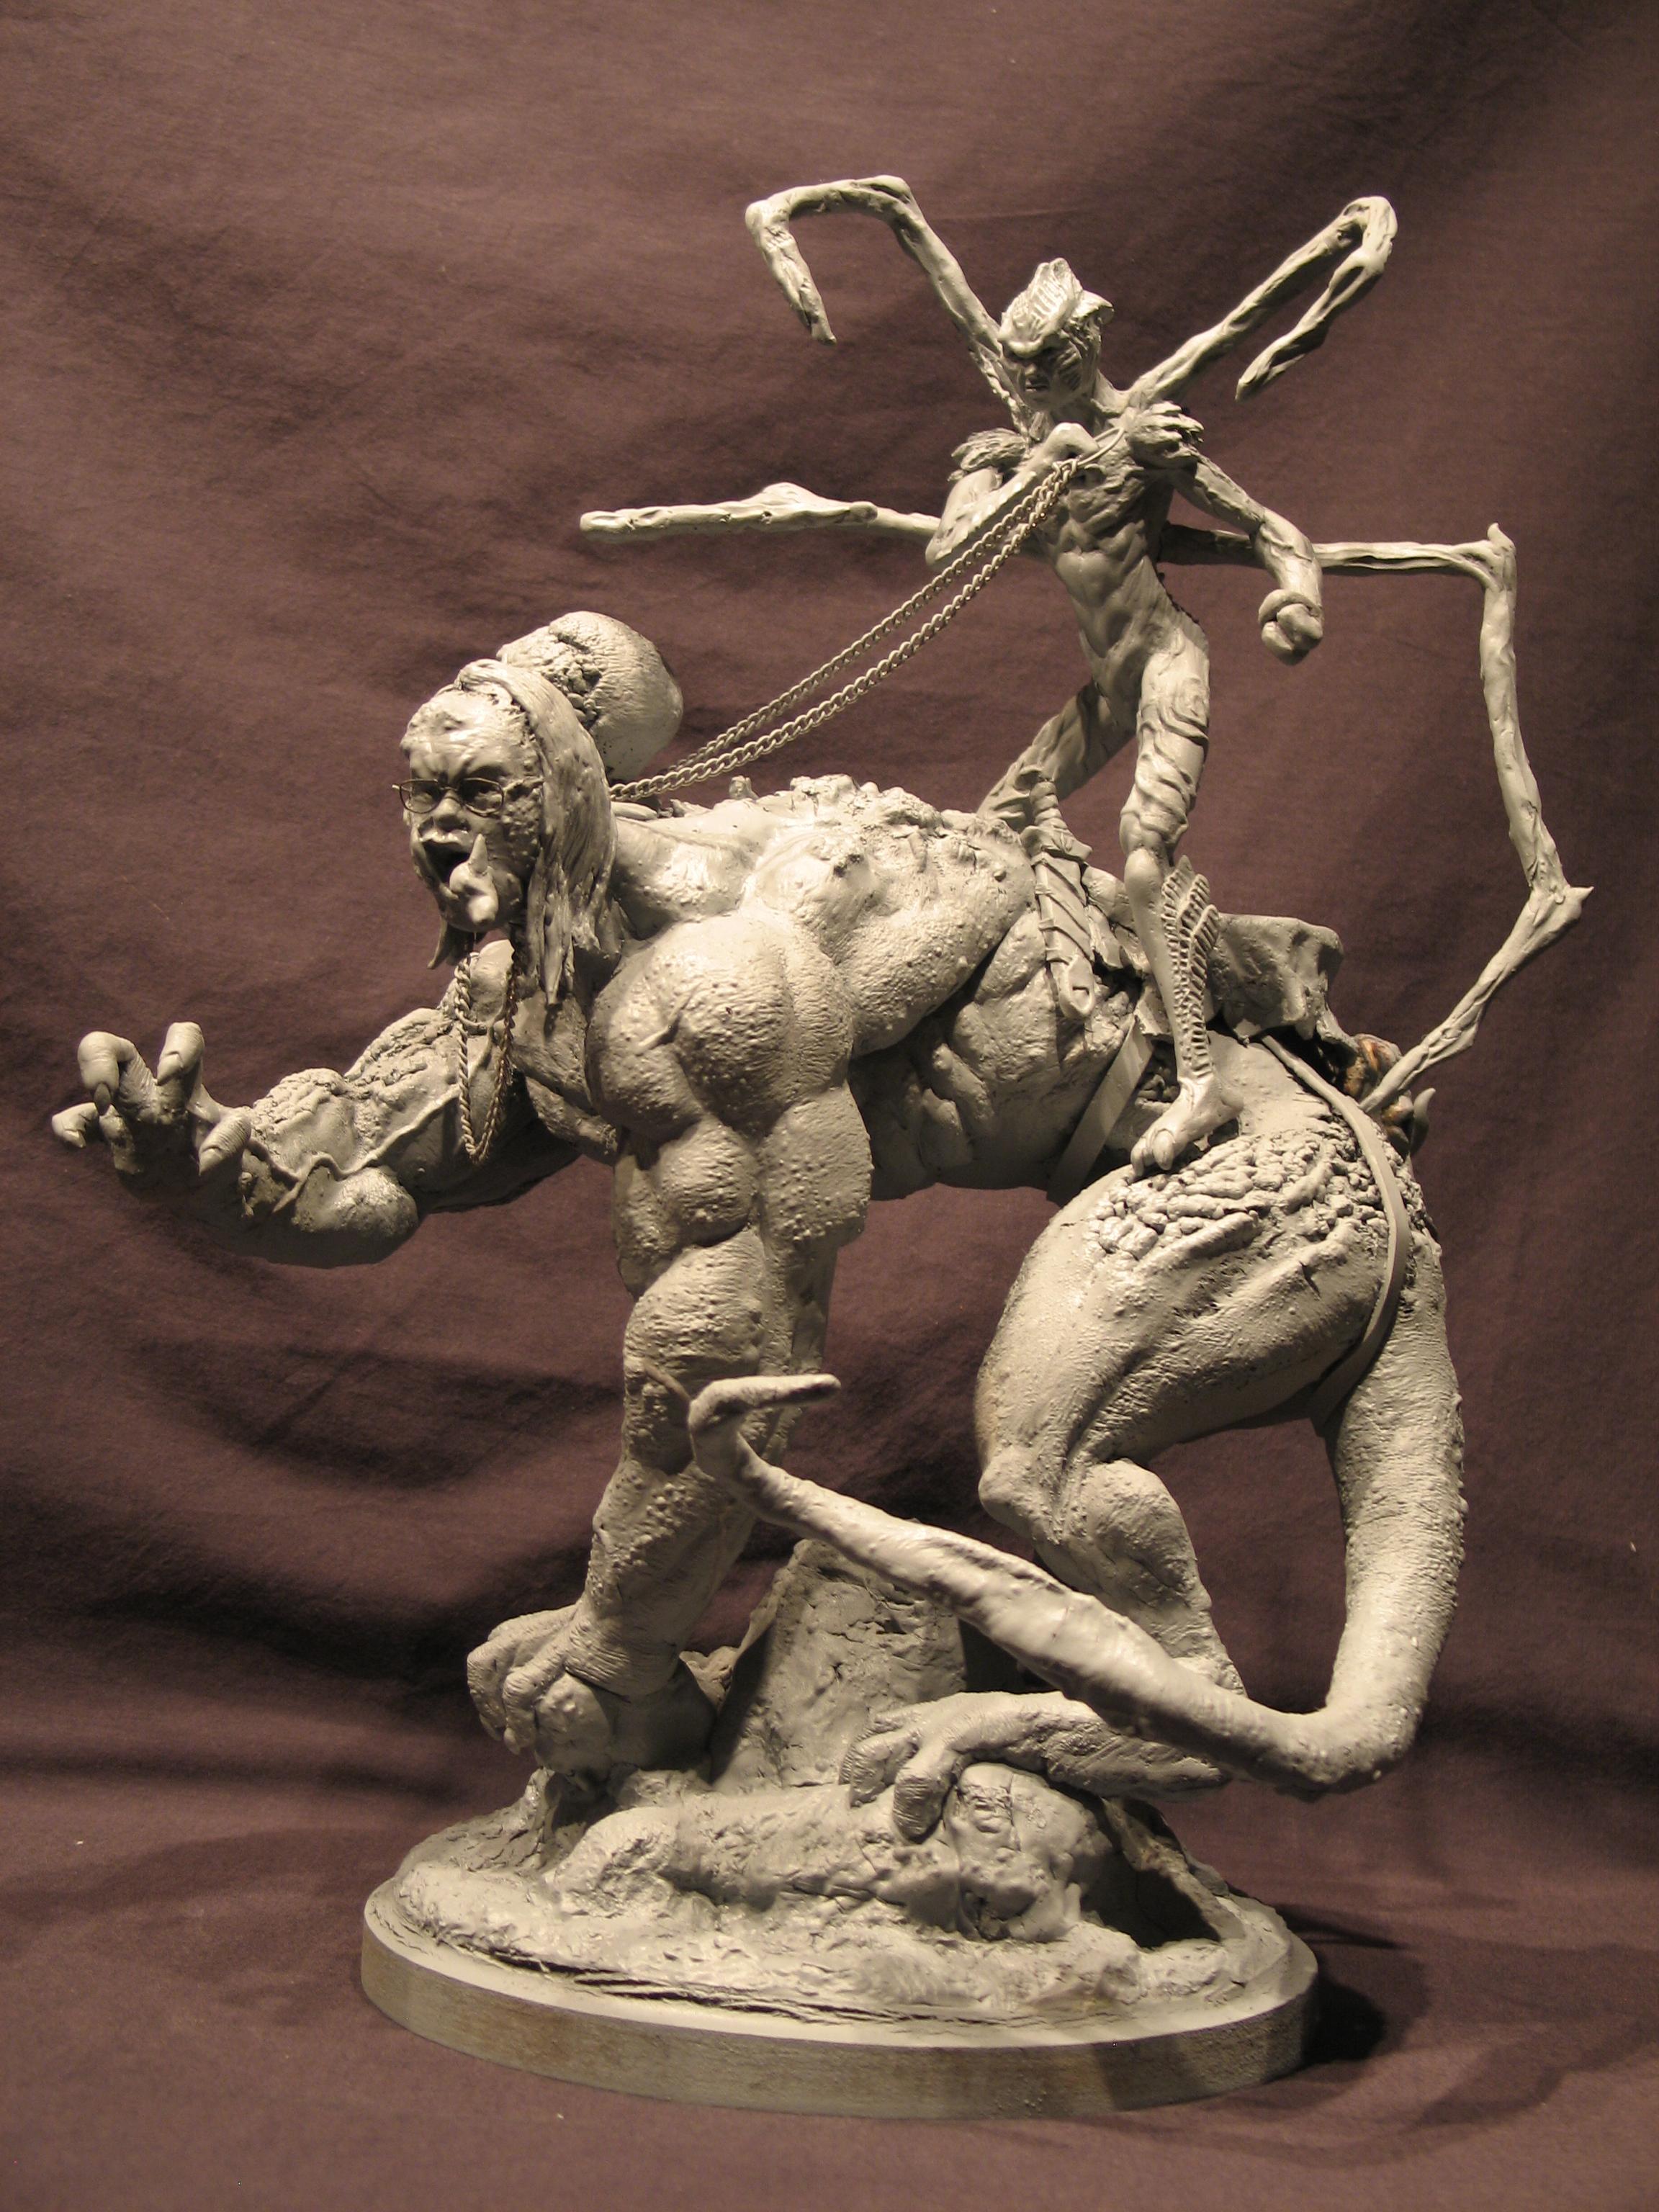 Spiderzero Riding the Shiflett Monster (Concours Shiflett 2) S151